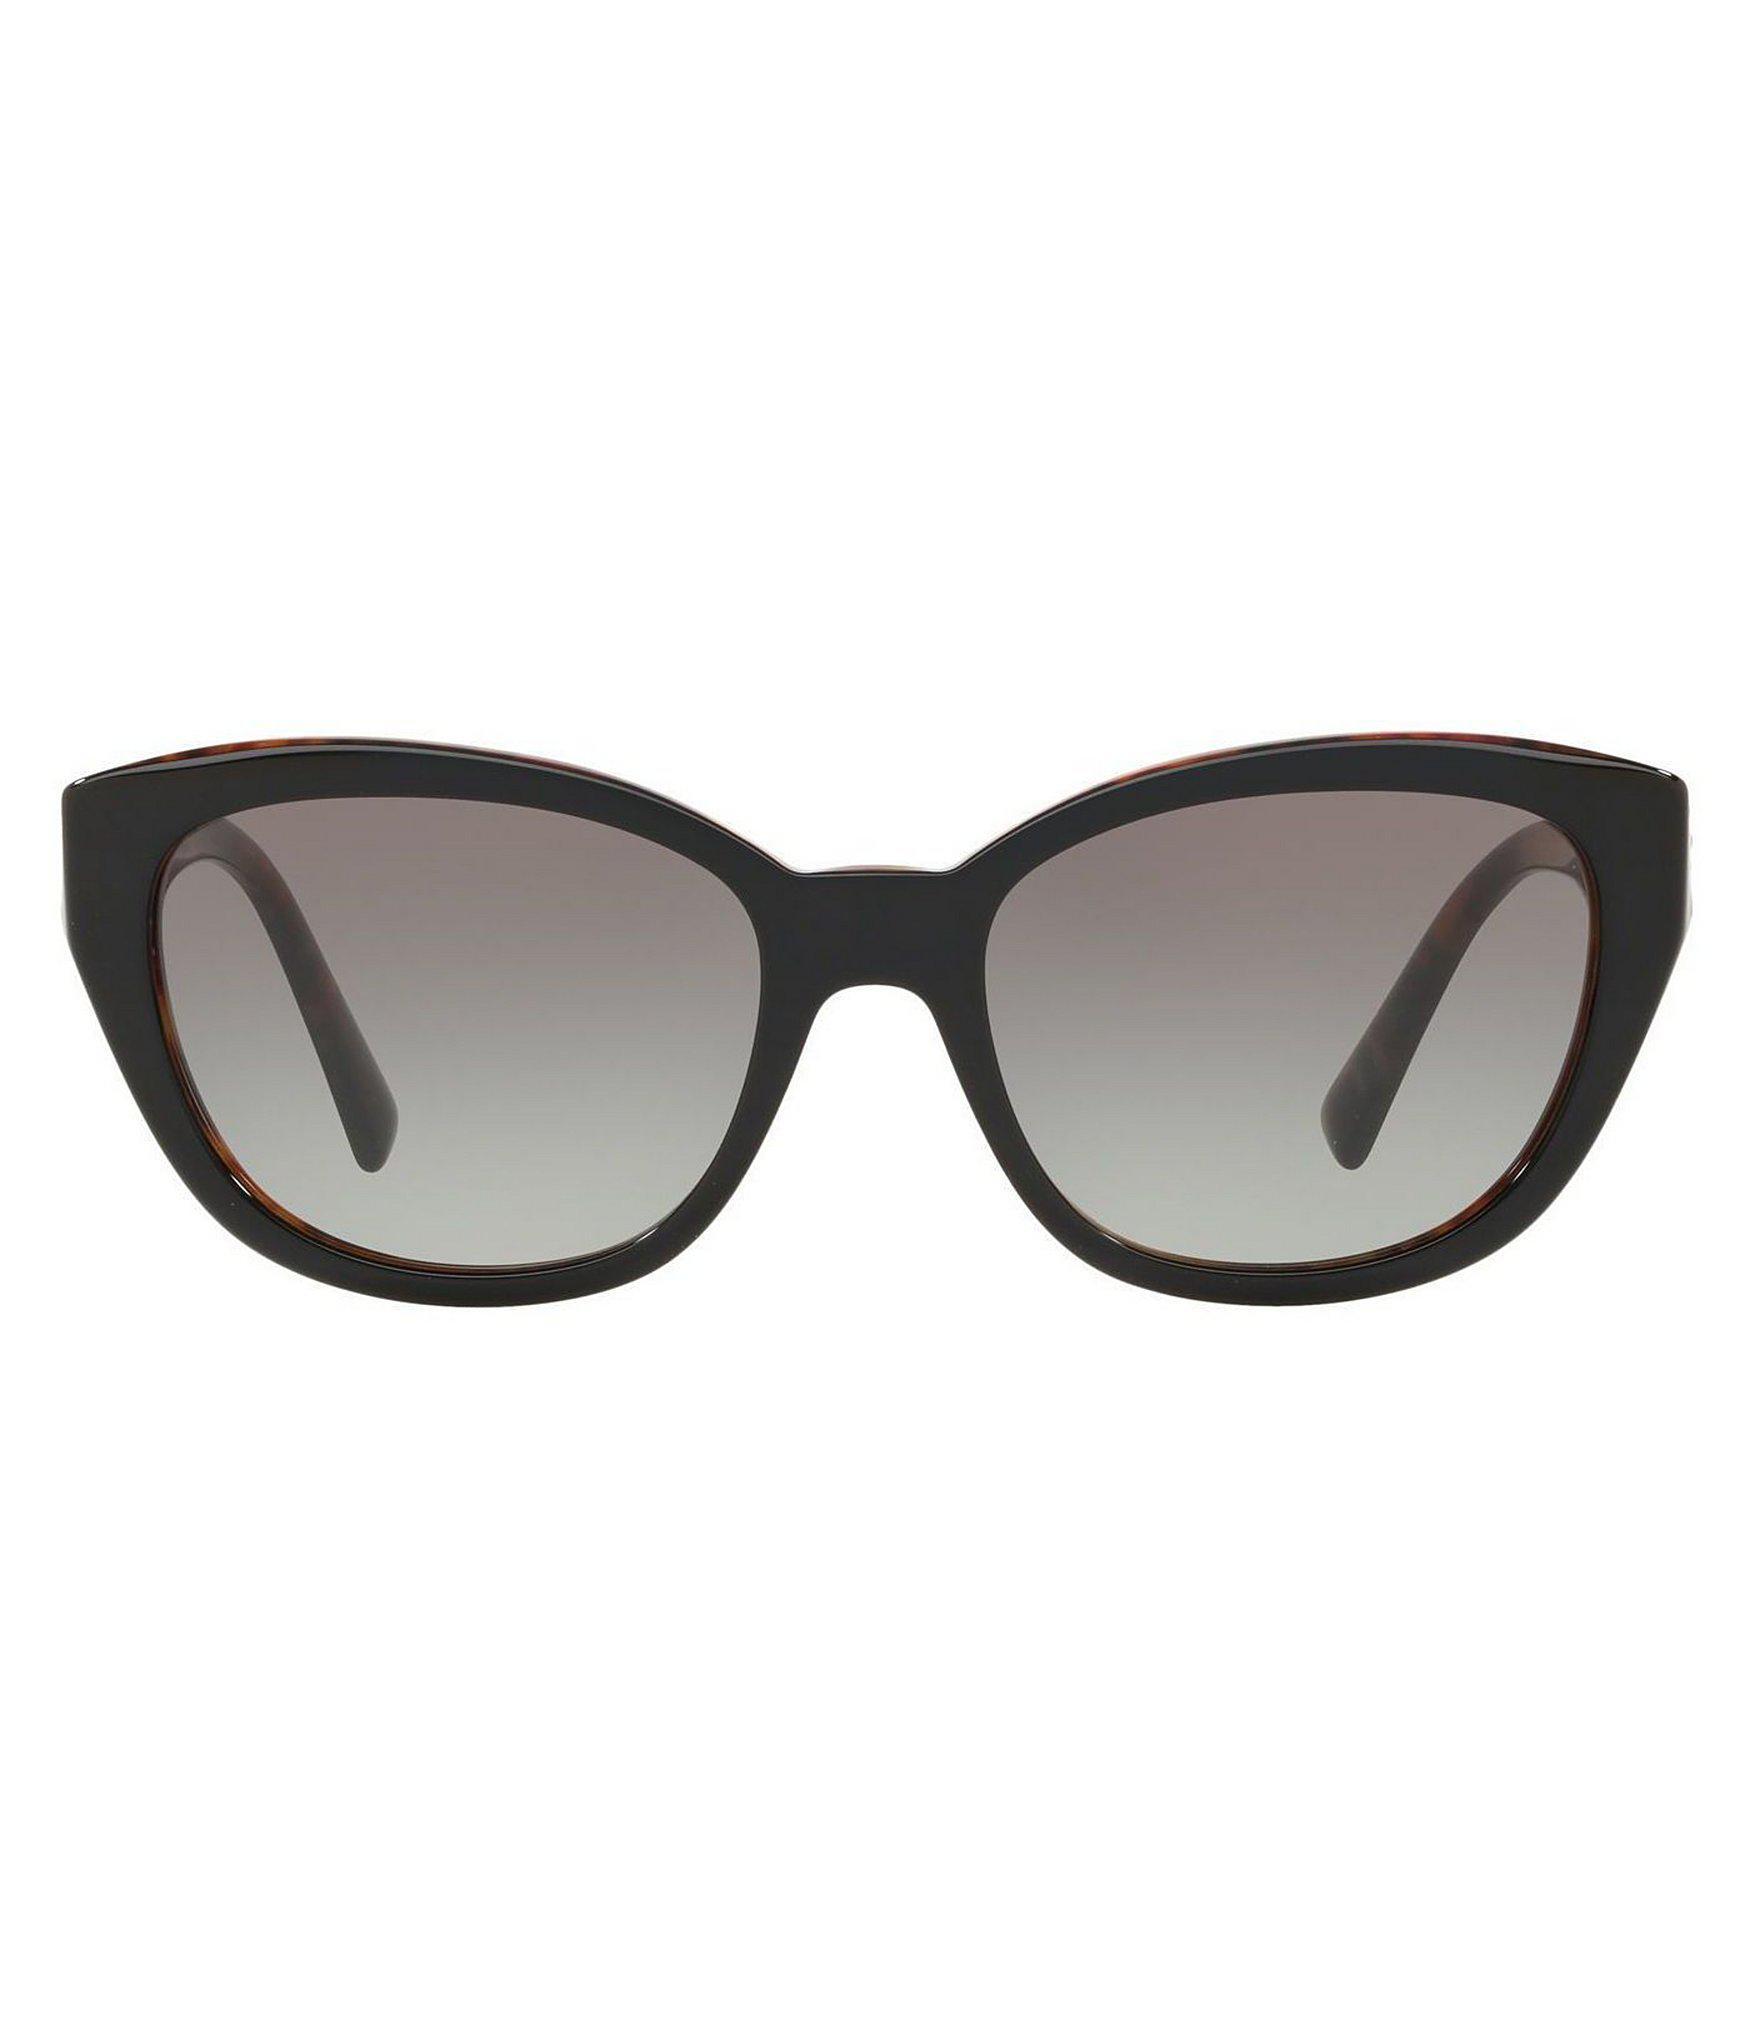 8f826a77c06e Versace - Black Medusa Rock Icon Sunglasses - Lyst. View fullscreen